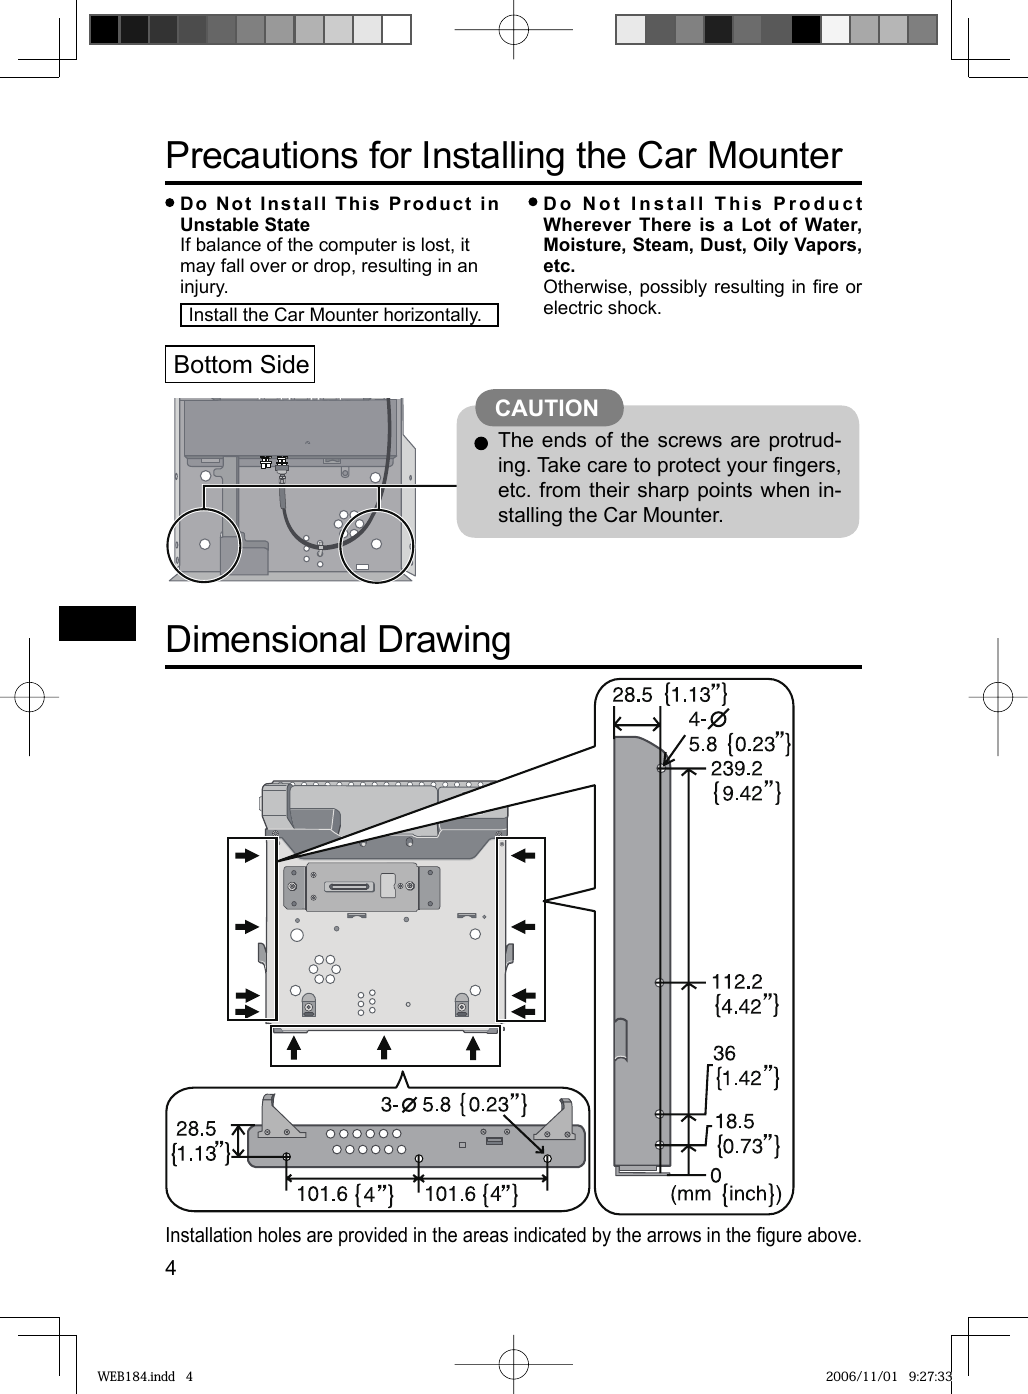 panasonic operating instructions for sa-ht700